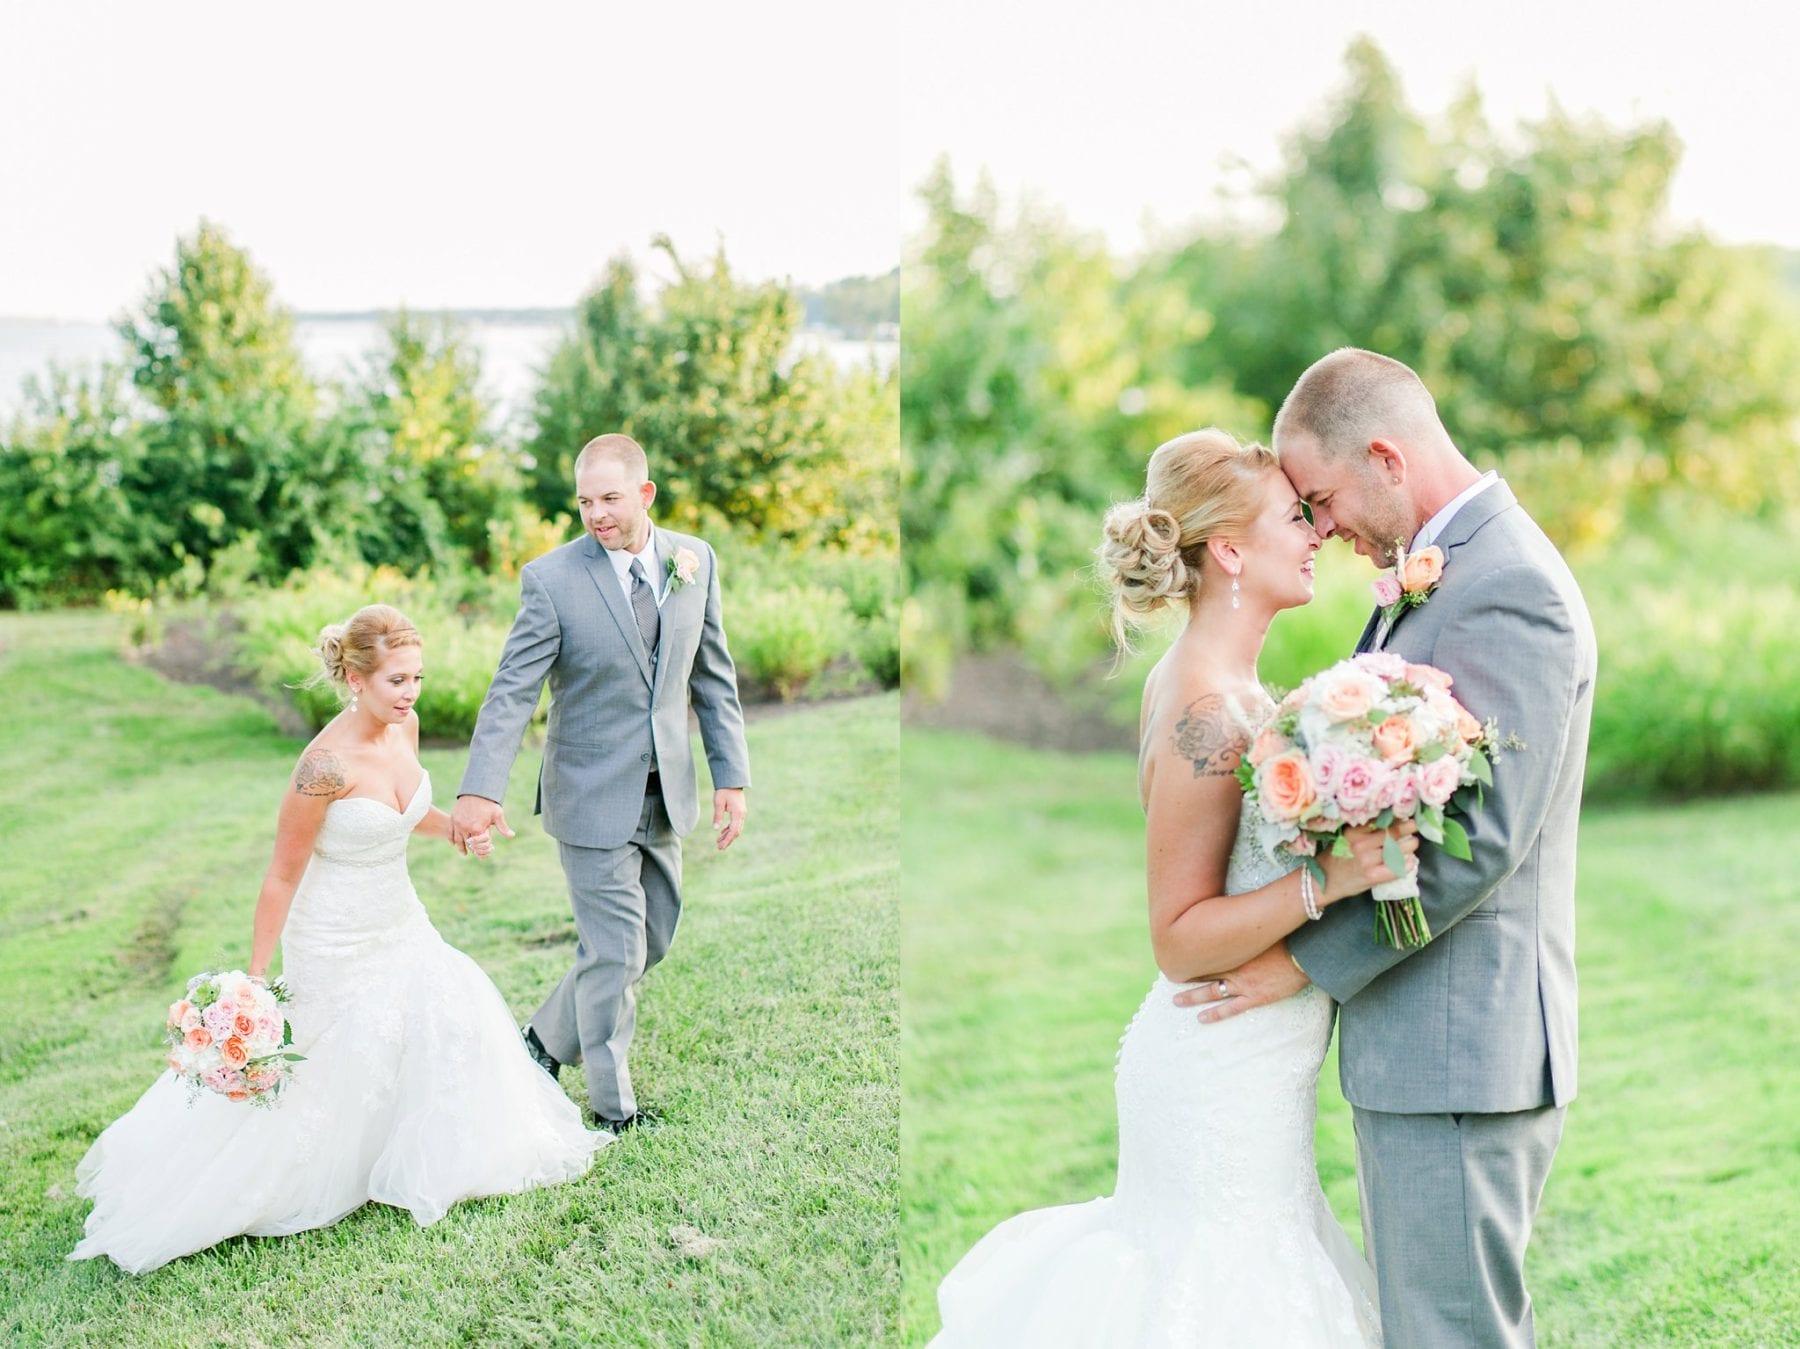 Waters Edge Wedding Photos Maryland Wedding Photographer Megan Kelsey Photography Katie & Conor-510.JPG